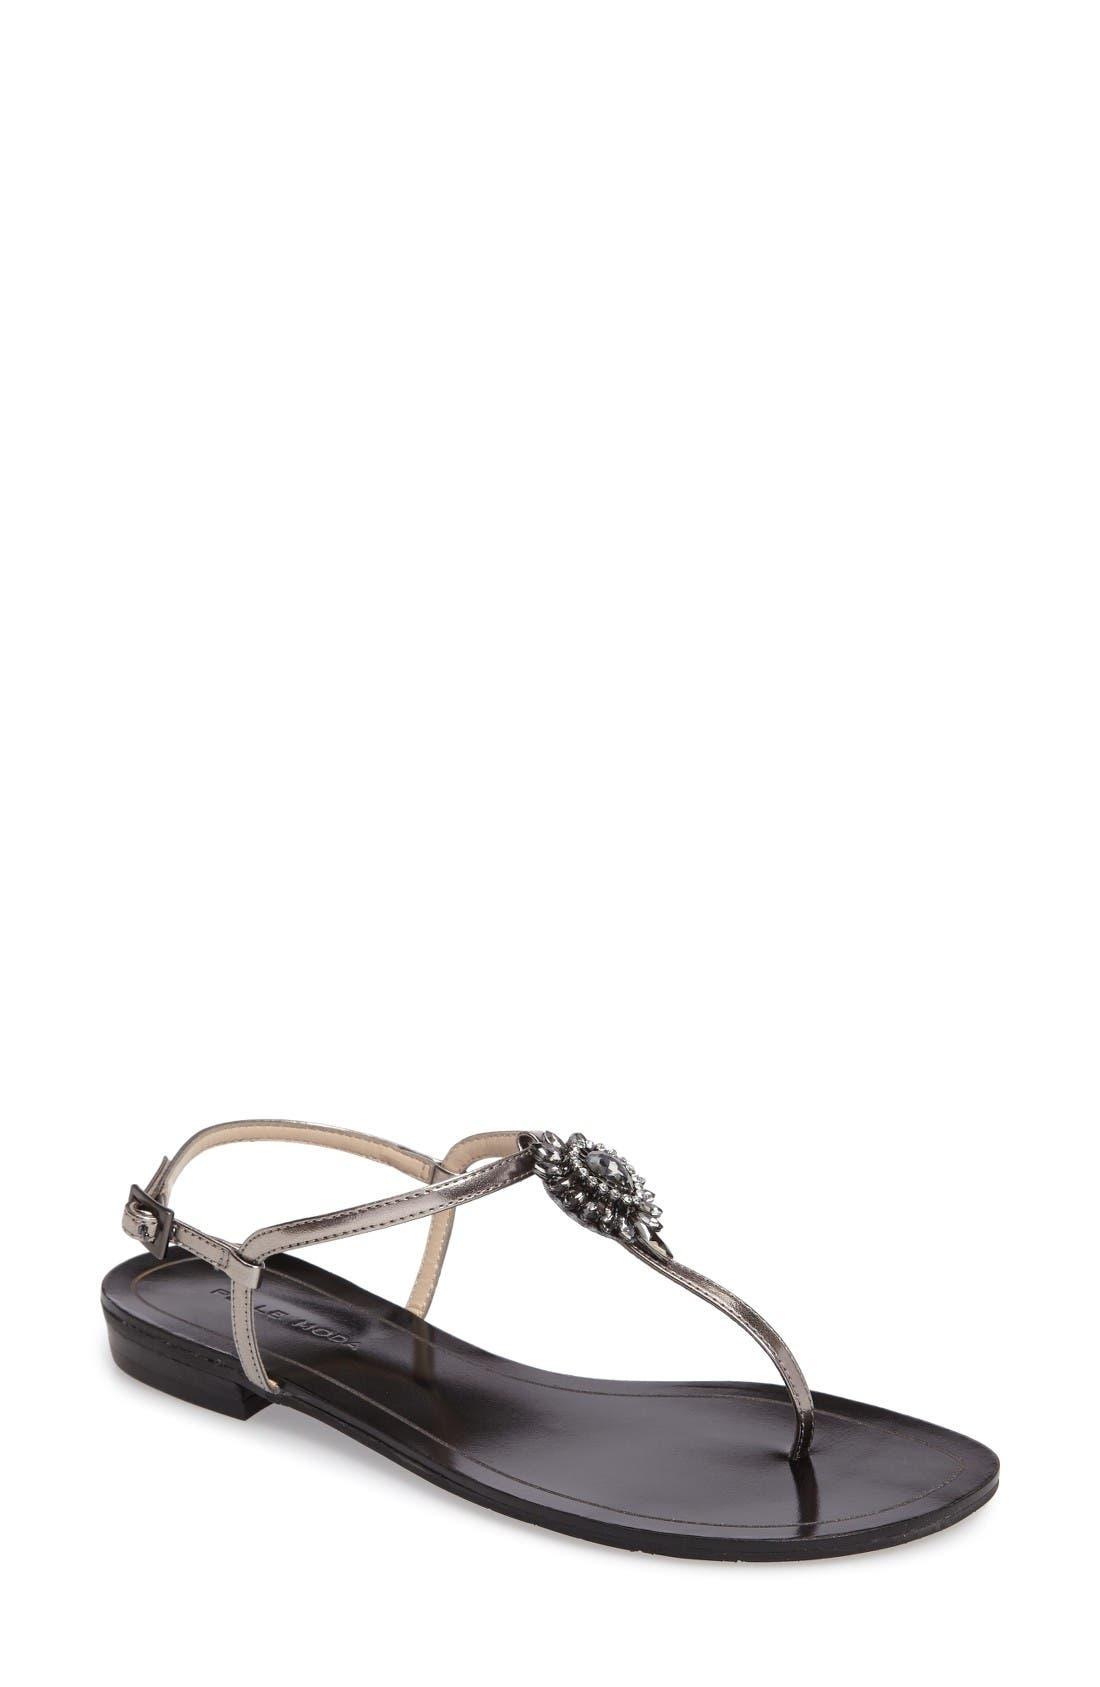 Alternate Image 1 Selected - Pelle Moda Baxley 3 Crystal Embellished Sandal (Women)